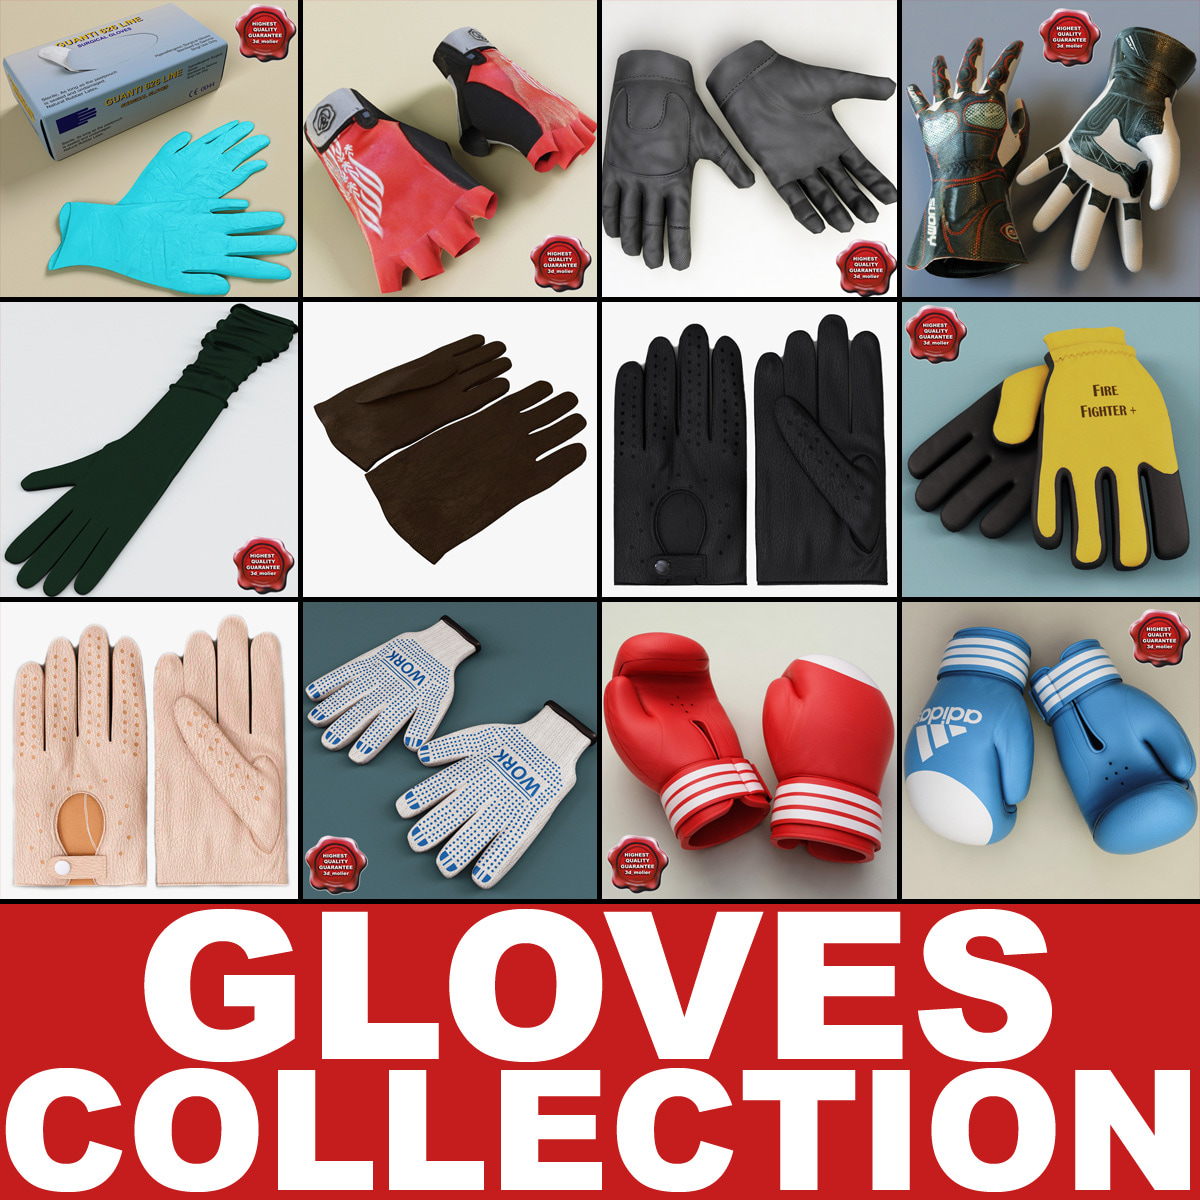 Gloves_Collection_V4_000.jpg